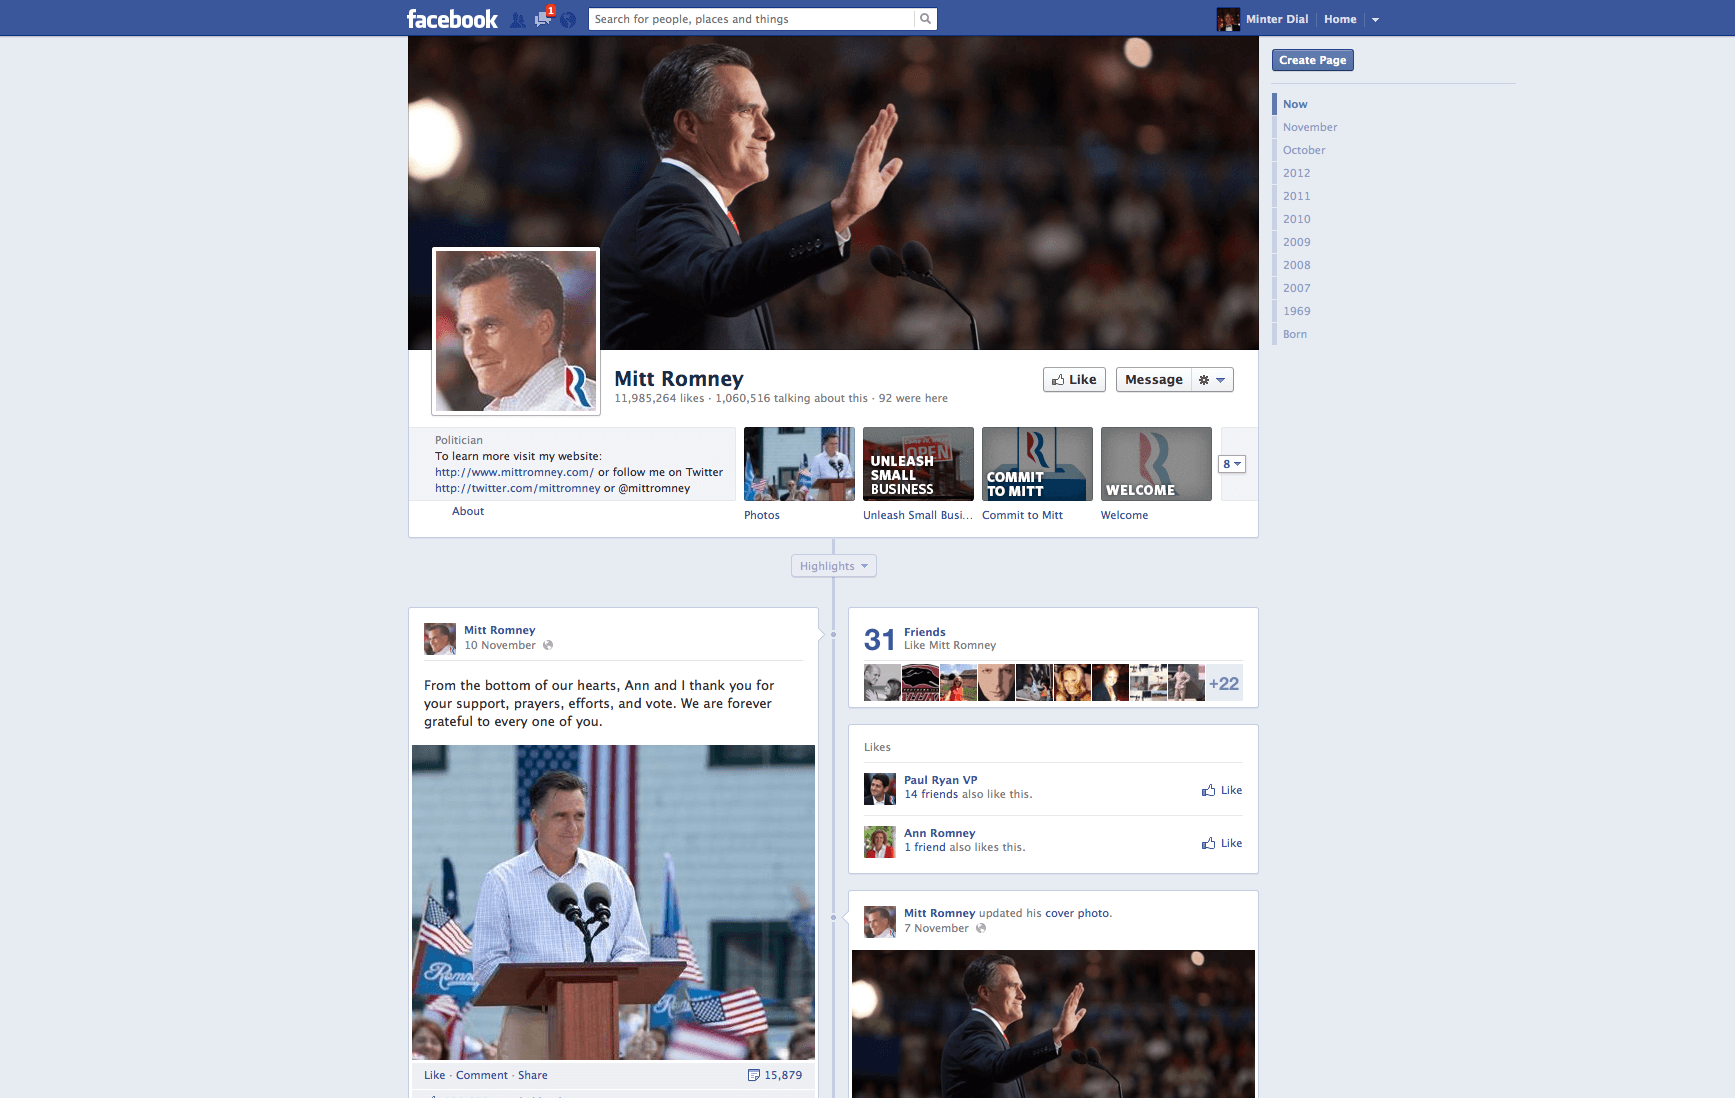 Mitt Romney Facebook page, The Myndset Digital marketing and brand strategy